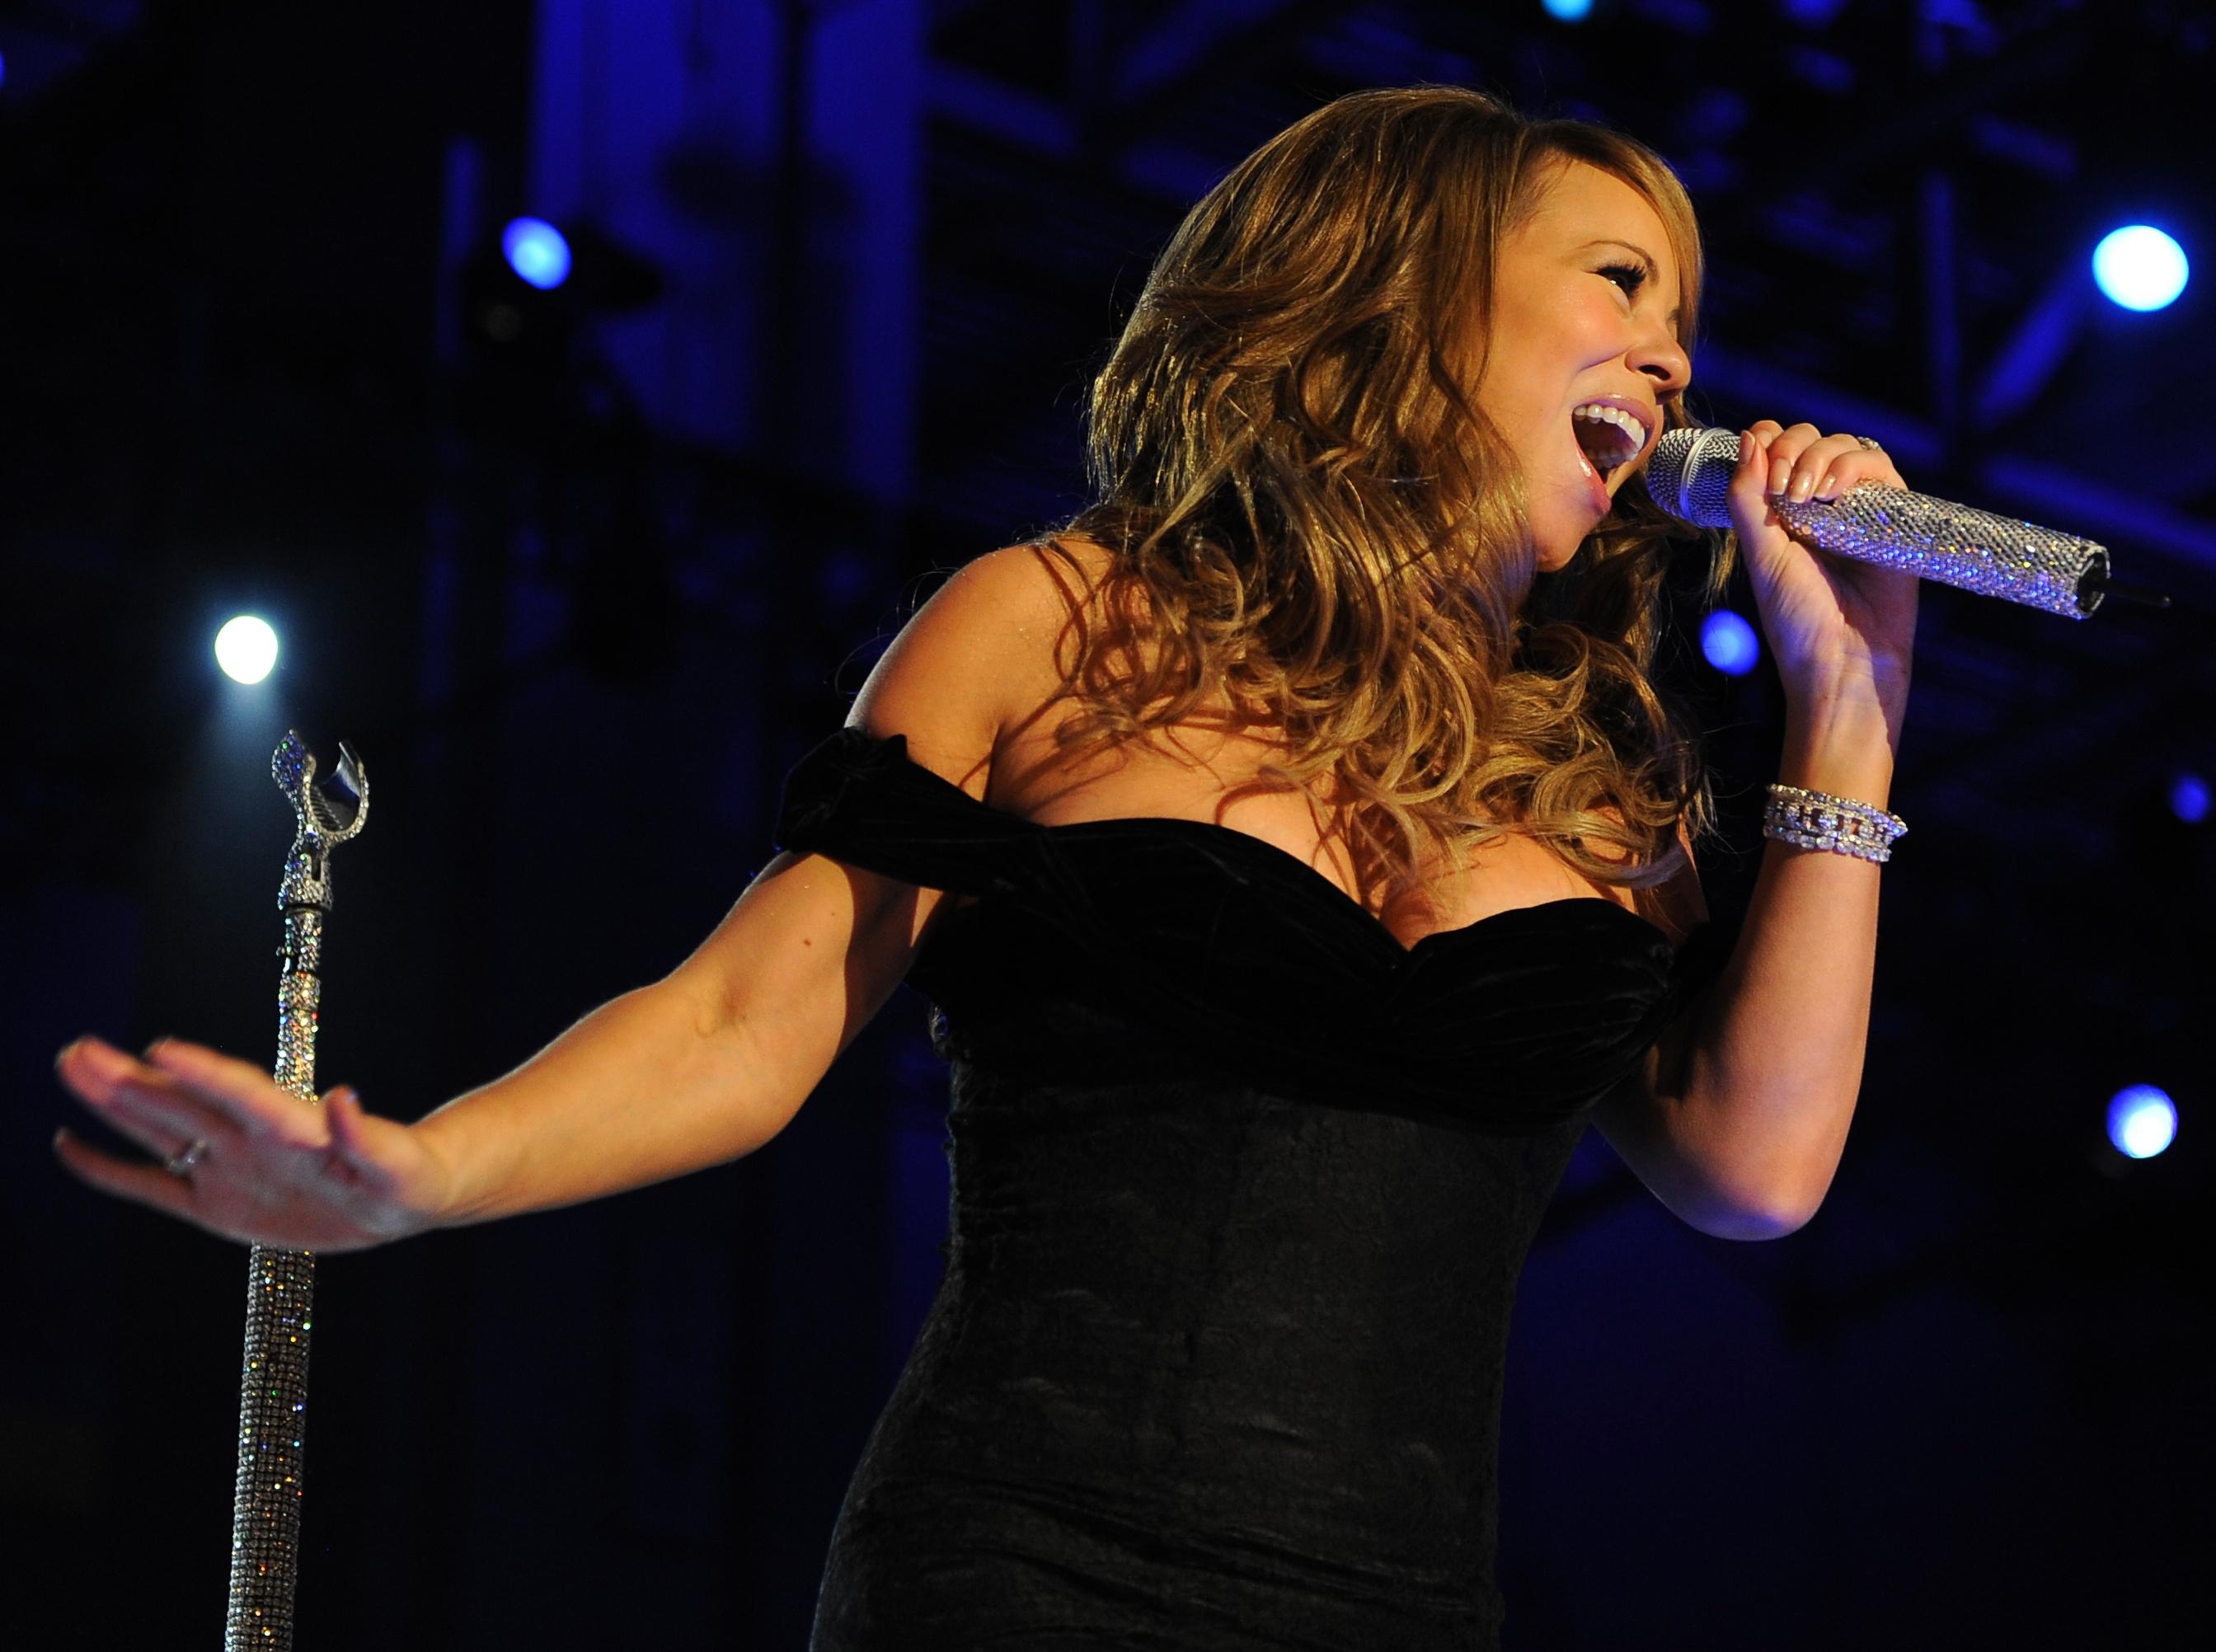 mariah carey singer wallpaper 53386